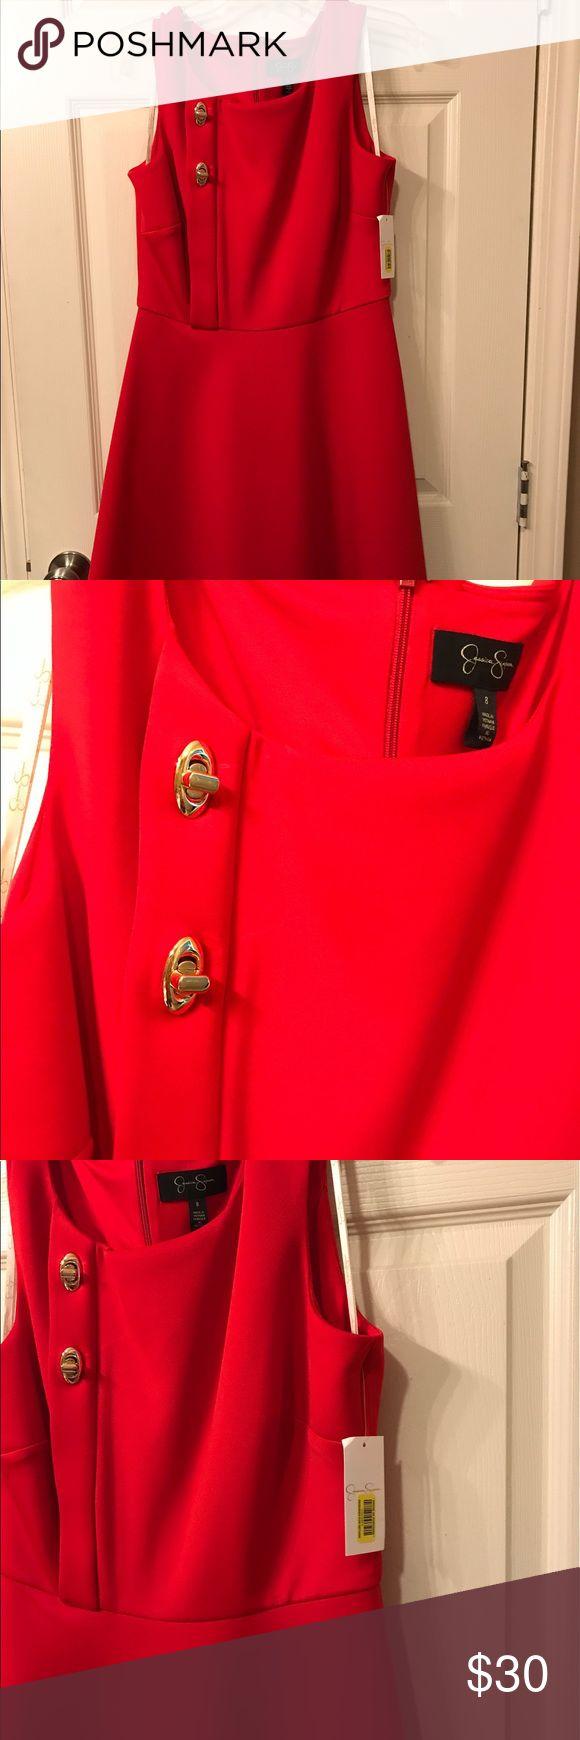 Jessica Simpson Red Sleeveless Dress Brand new sleeveless red dress Jessica Simpson Dresses